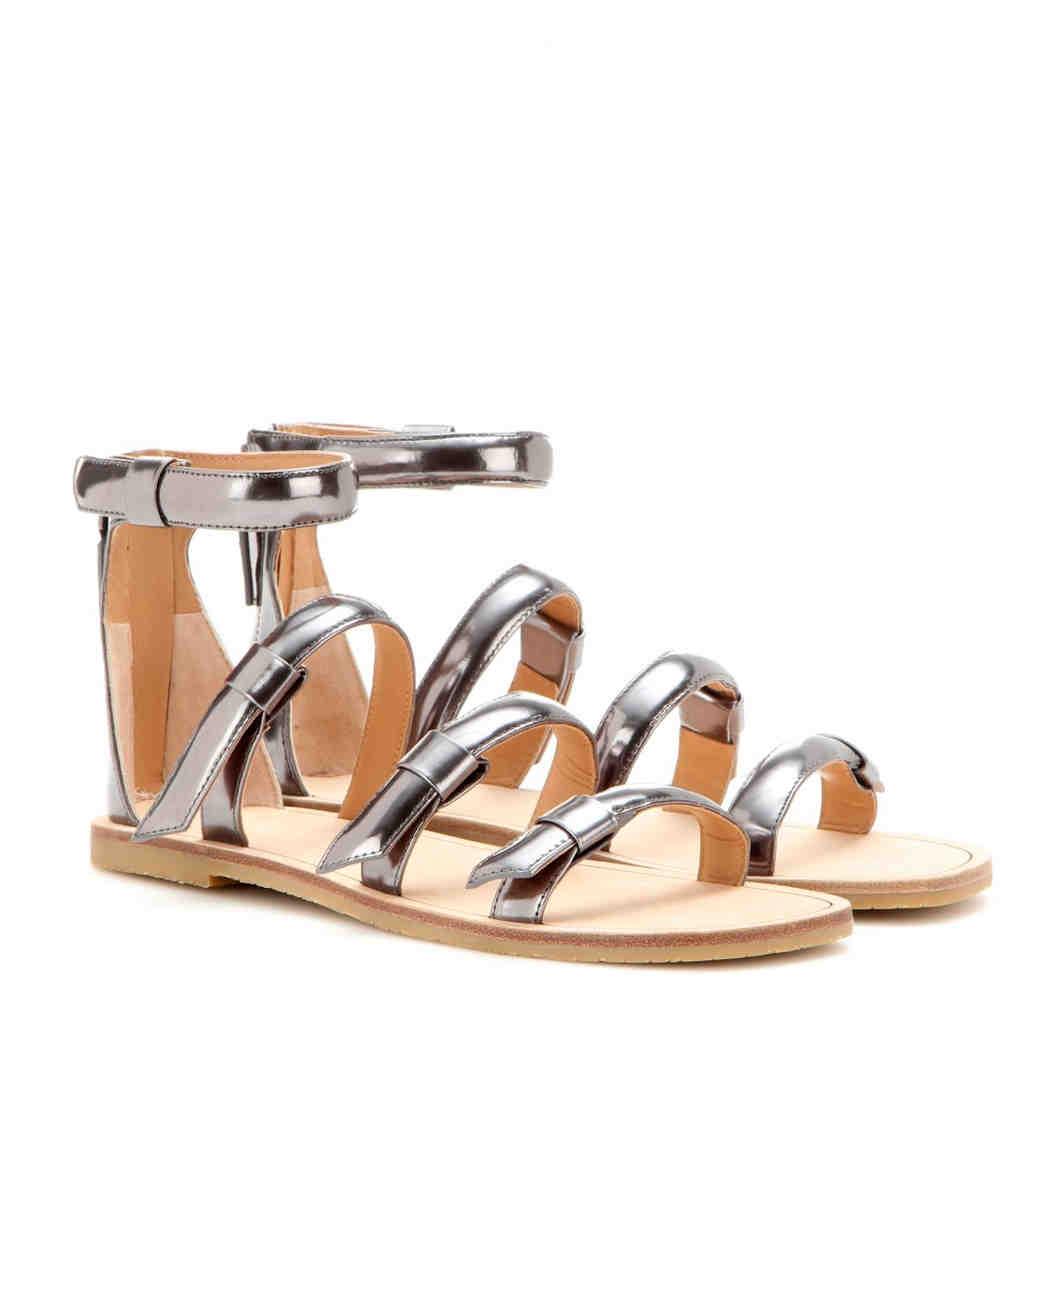 summer-wedding-shoes-marc-by-marc-jacobs-metallic-sandals-0515.jpg